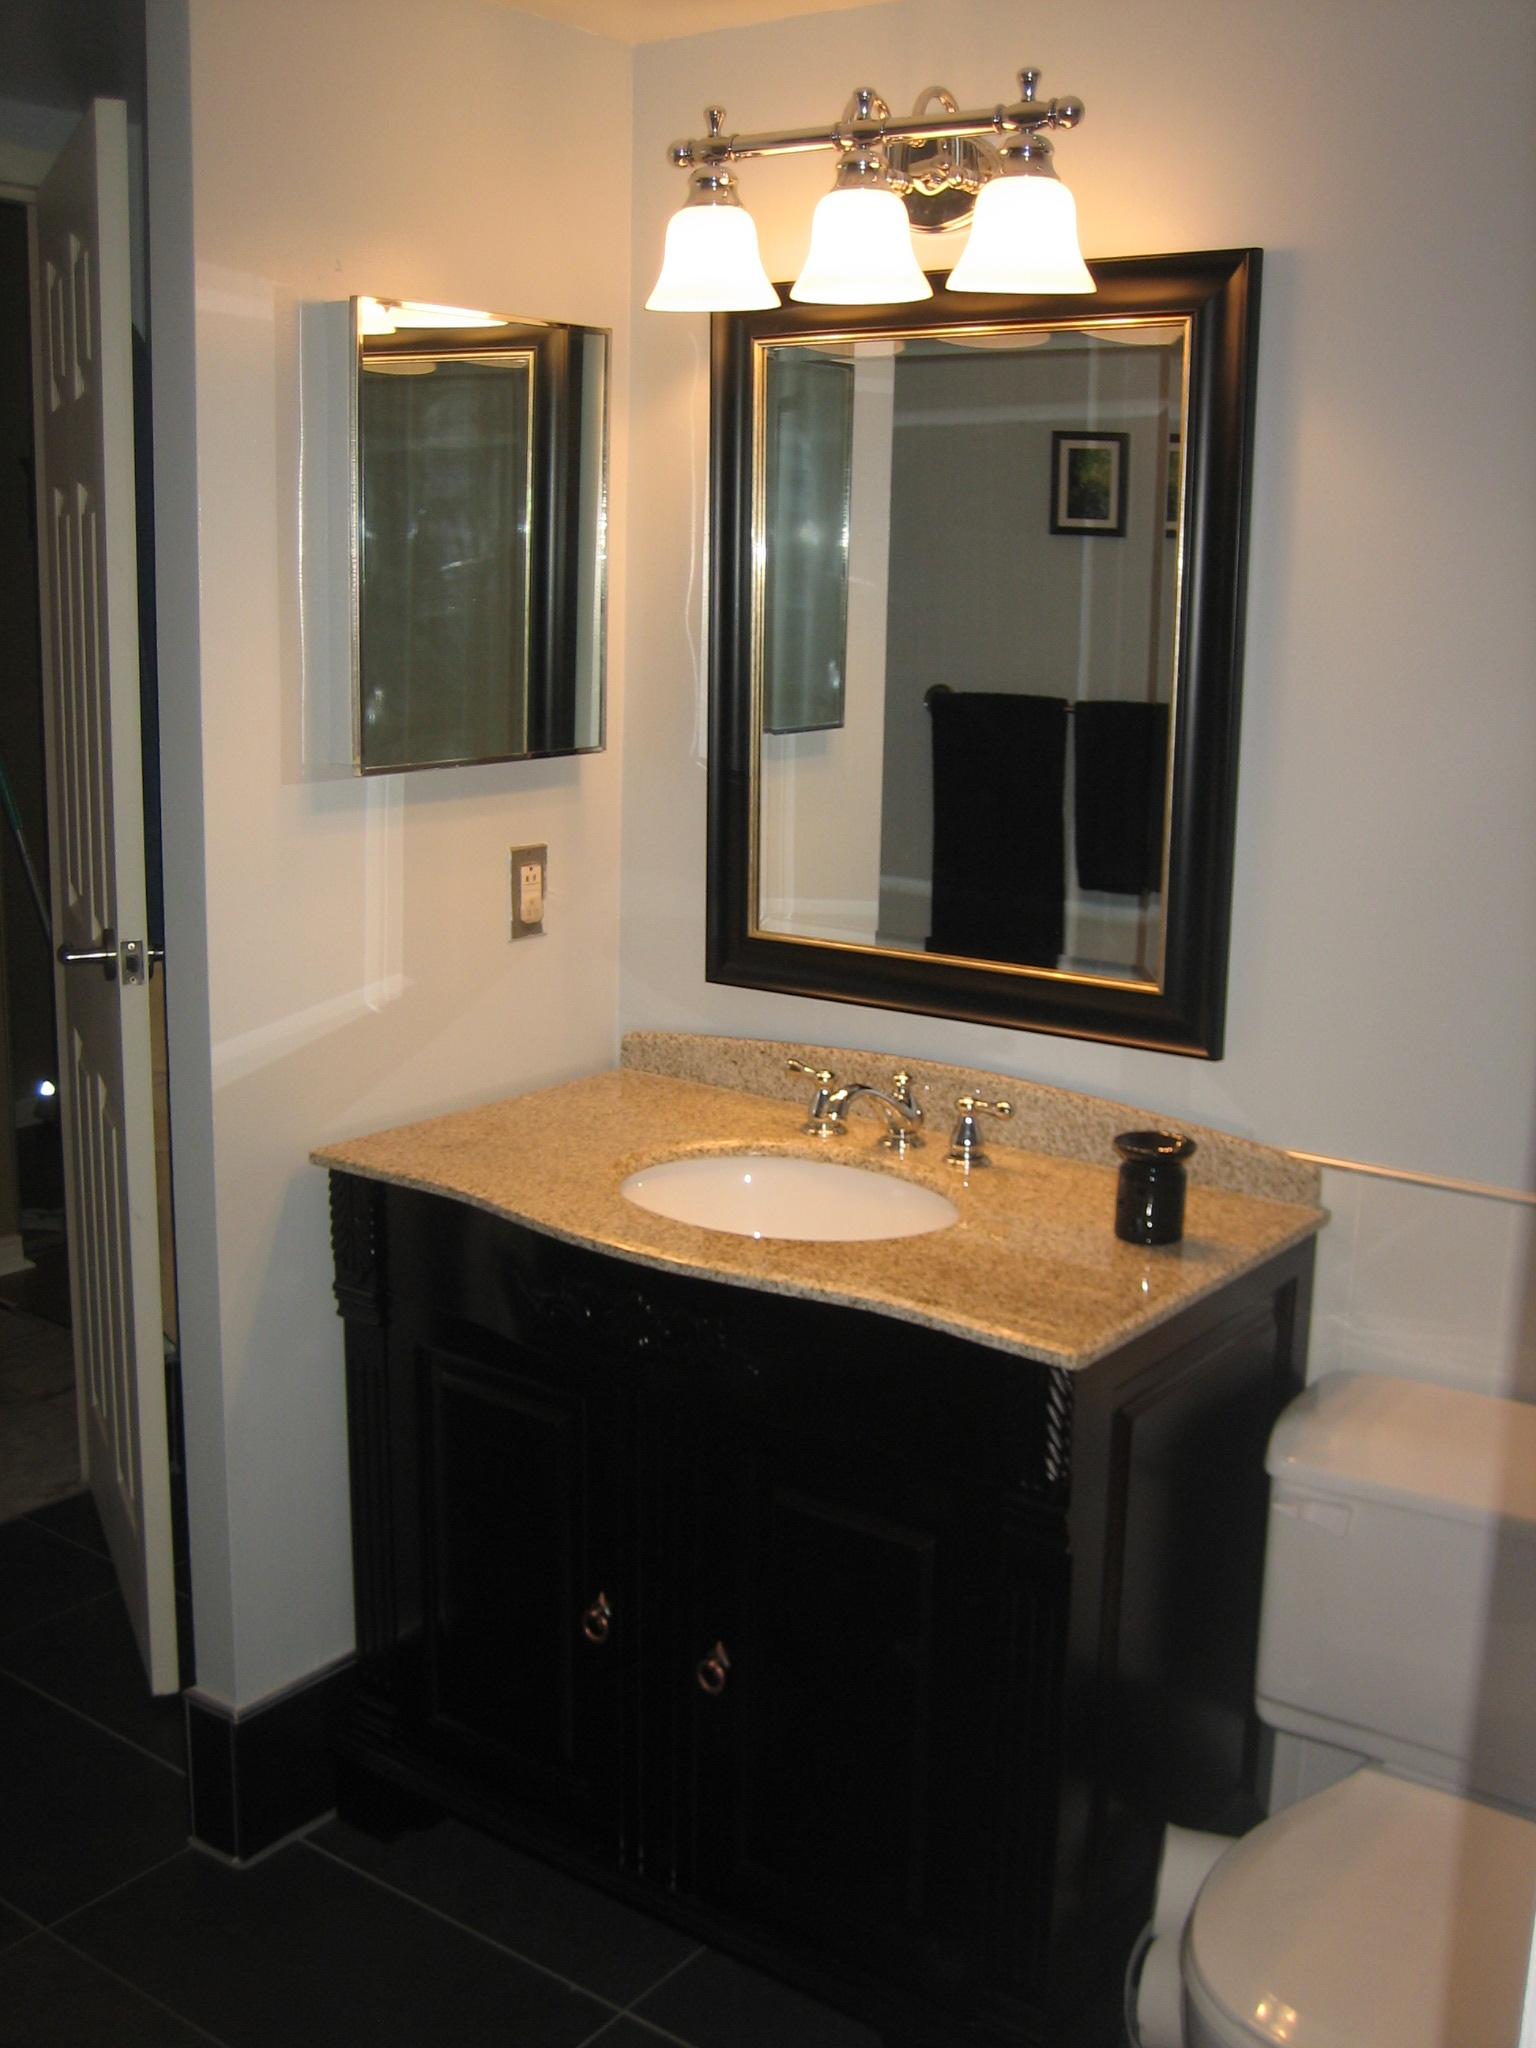 Condo Reno Washroom - Marble Mohogany Vanity 2007.JPG